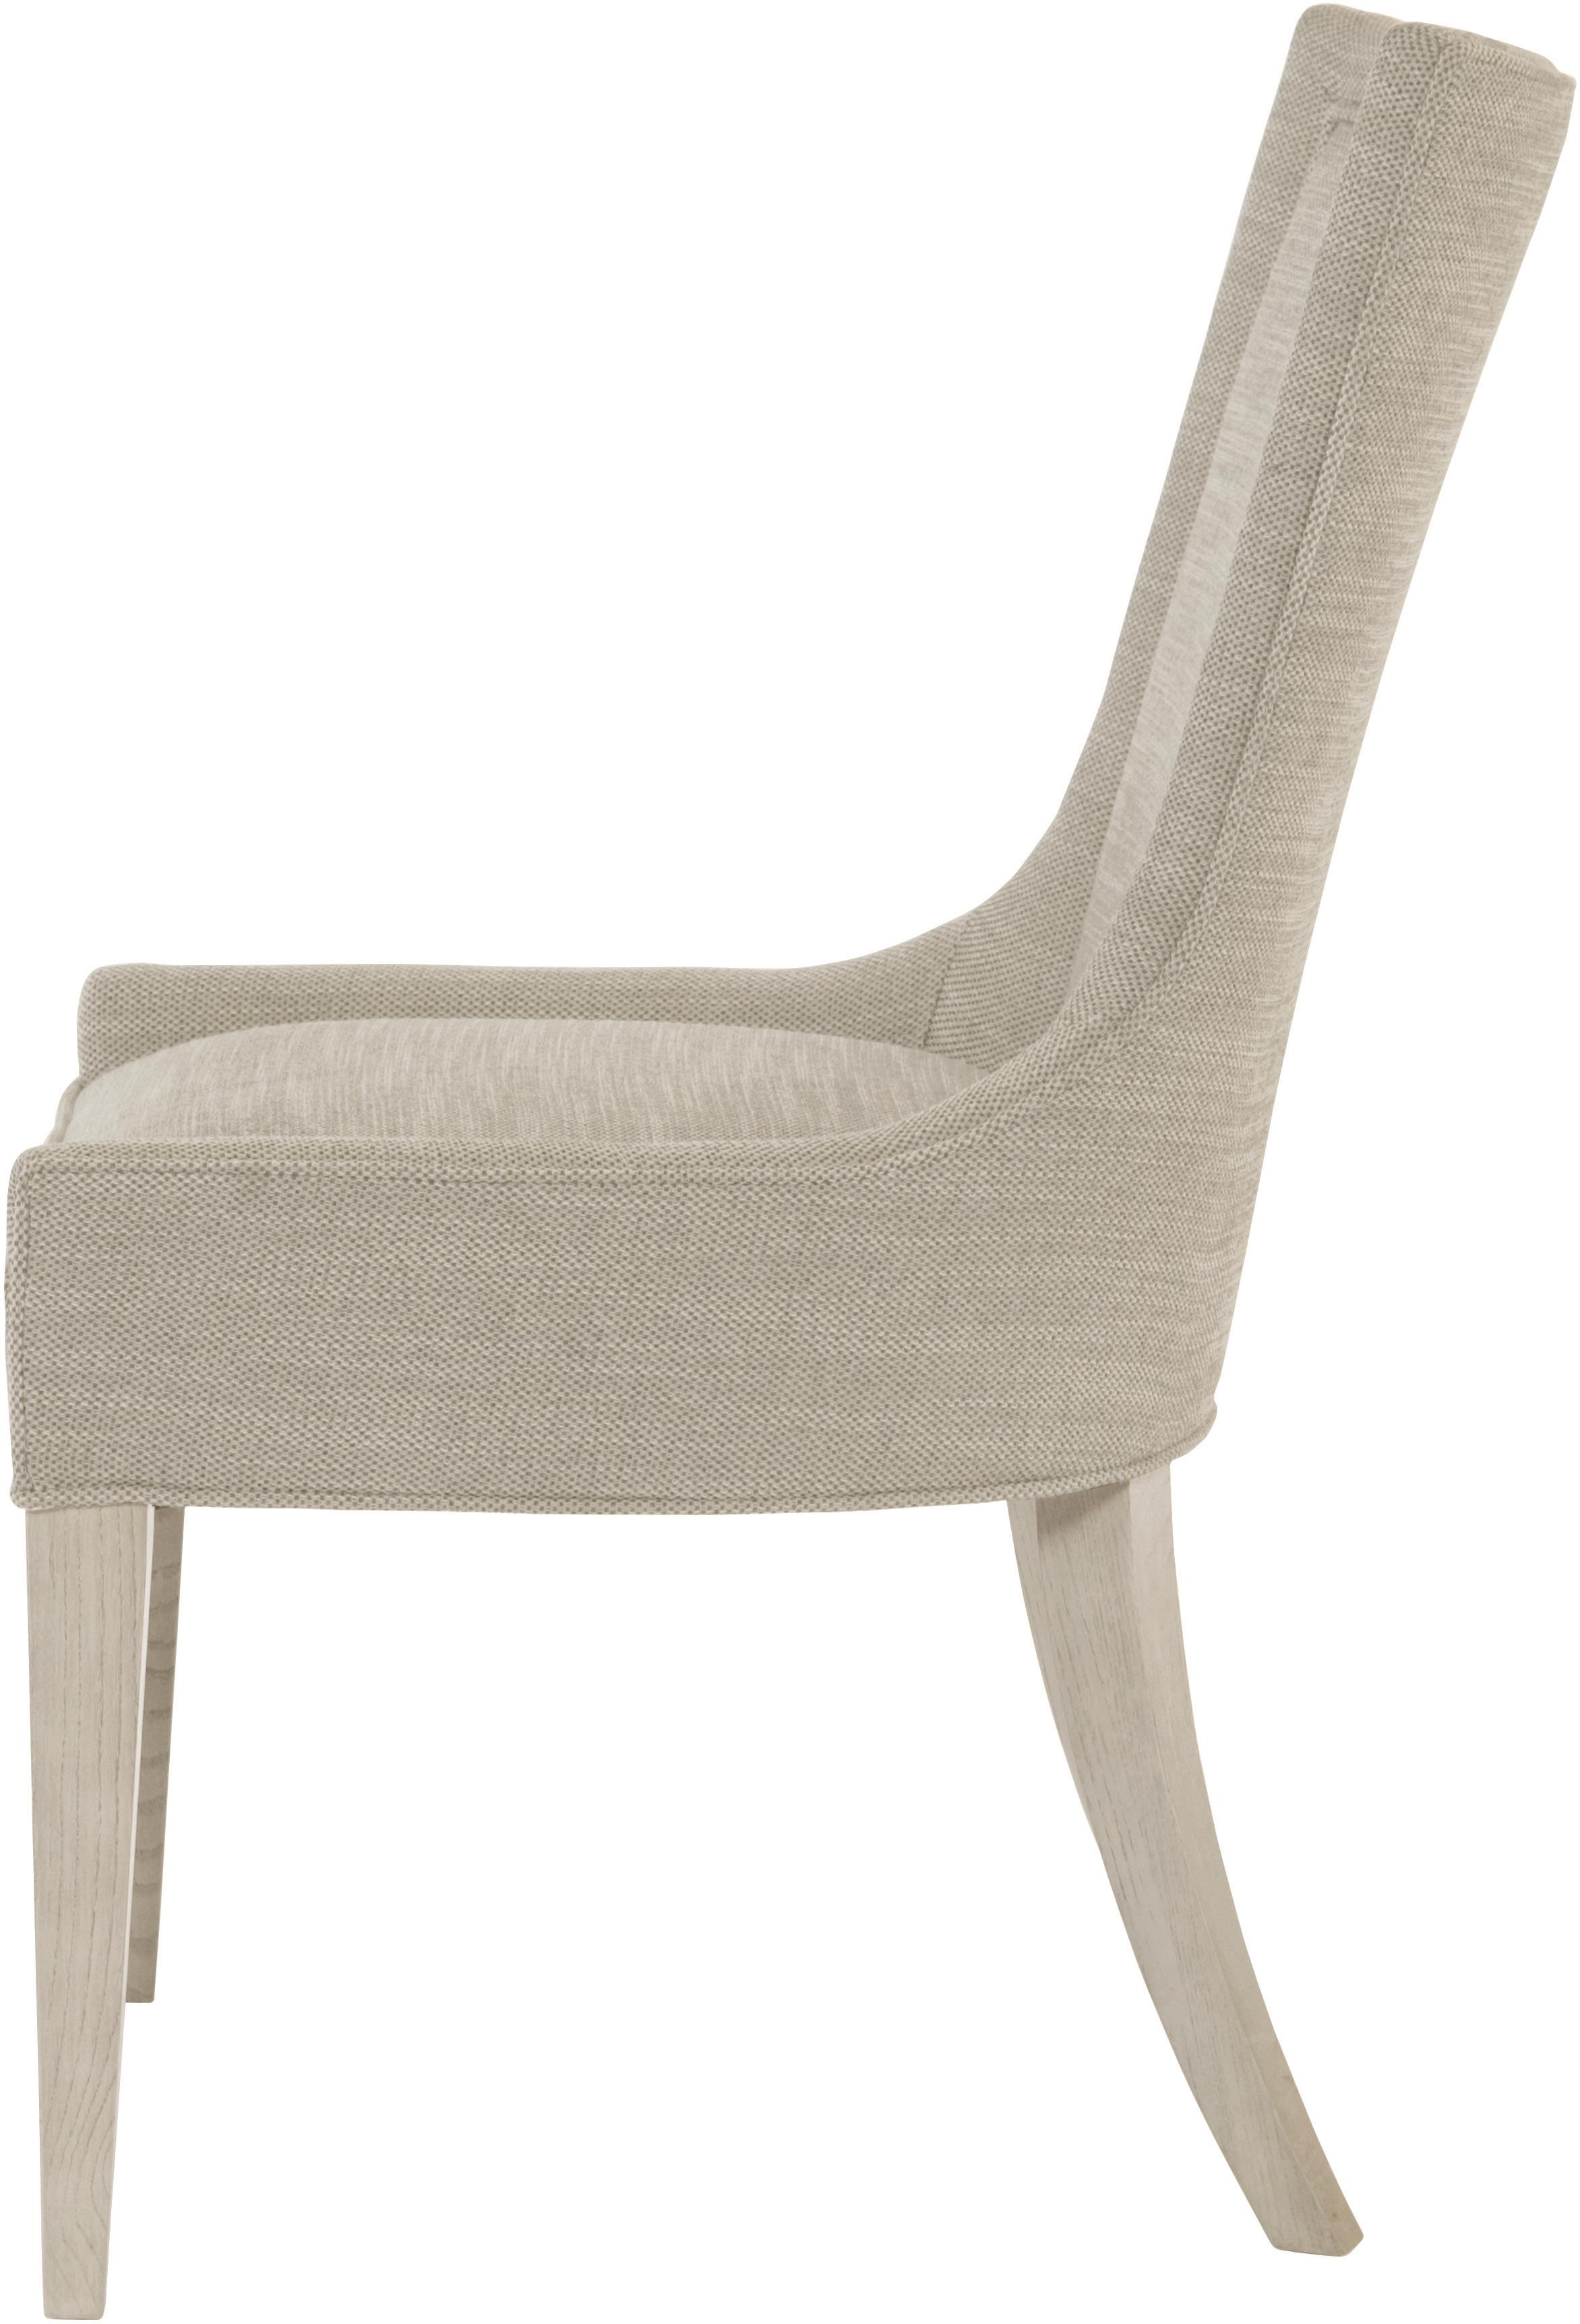 Bernhardt Criteria Customizable Sloped Arm Chair | Belfort ... - photo#36